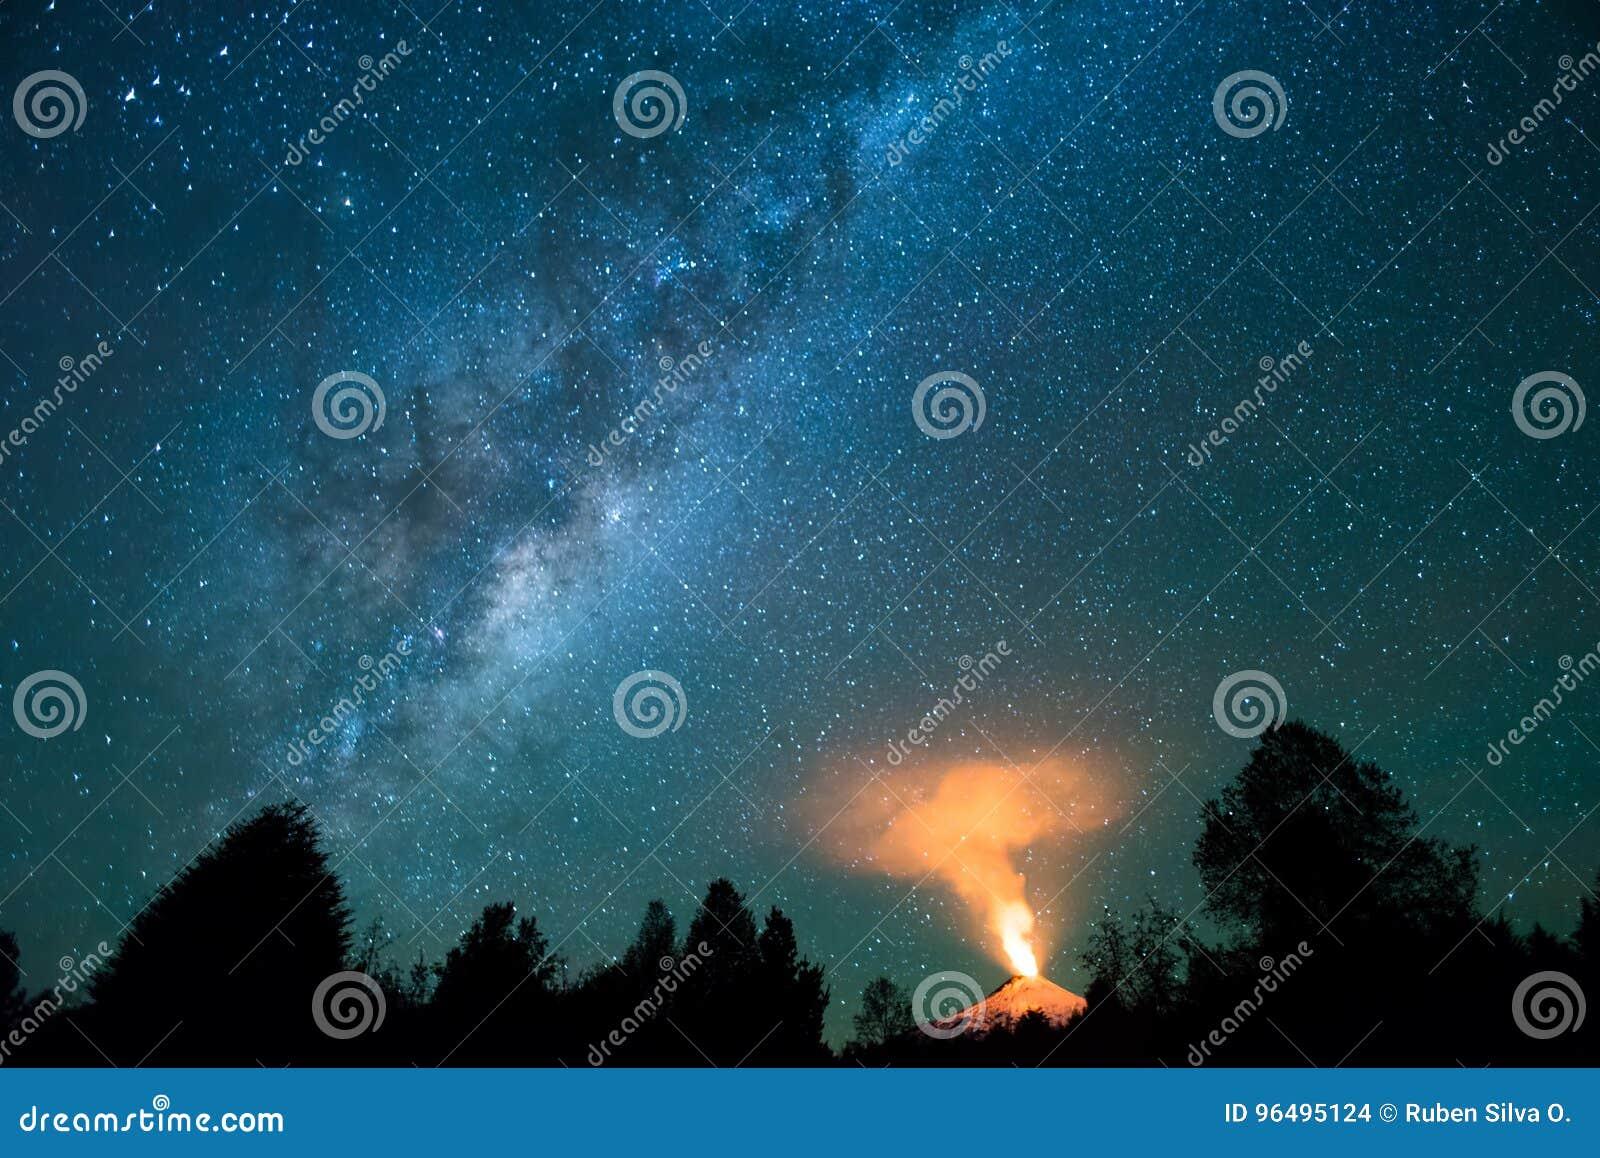 22-04-2017 ³ n PucÃ, Чили Вулкан Villarrica